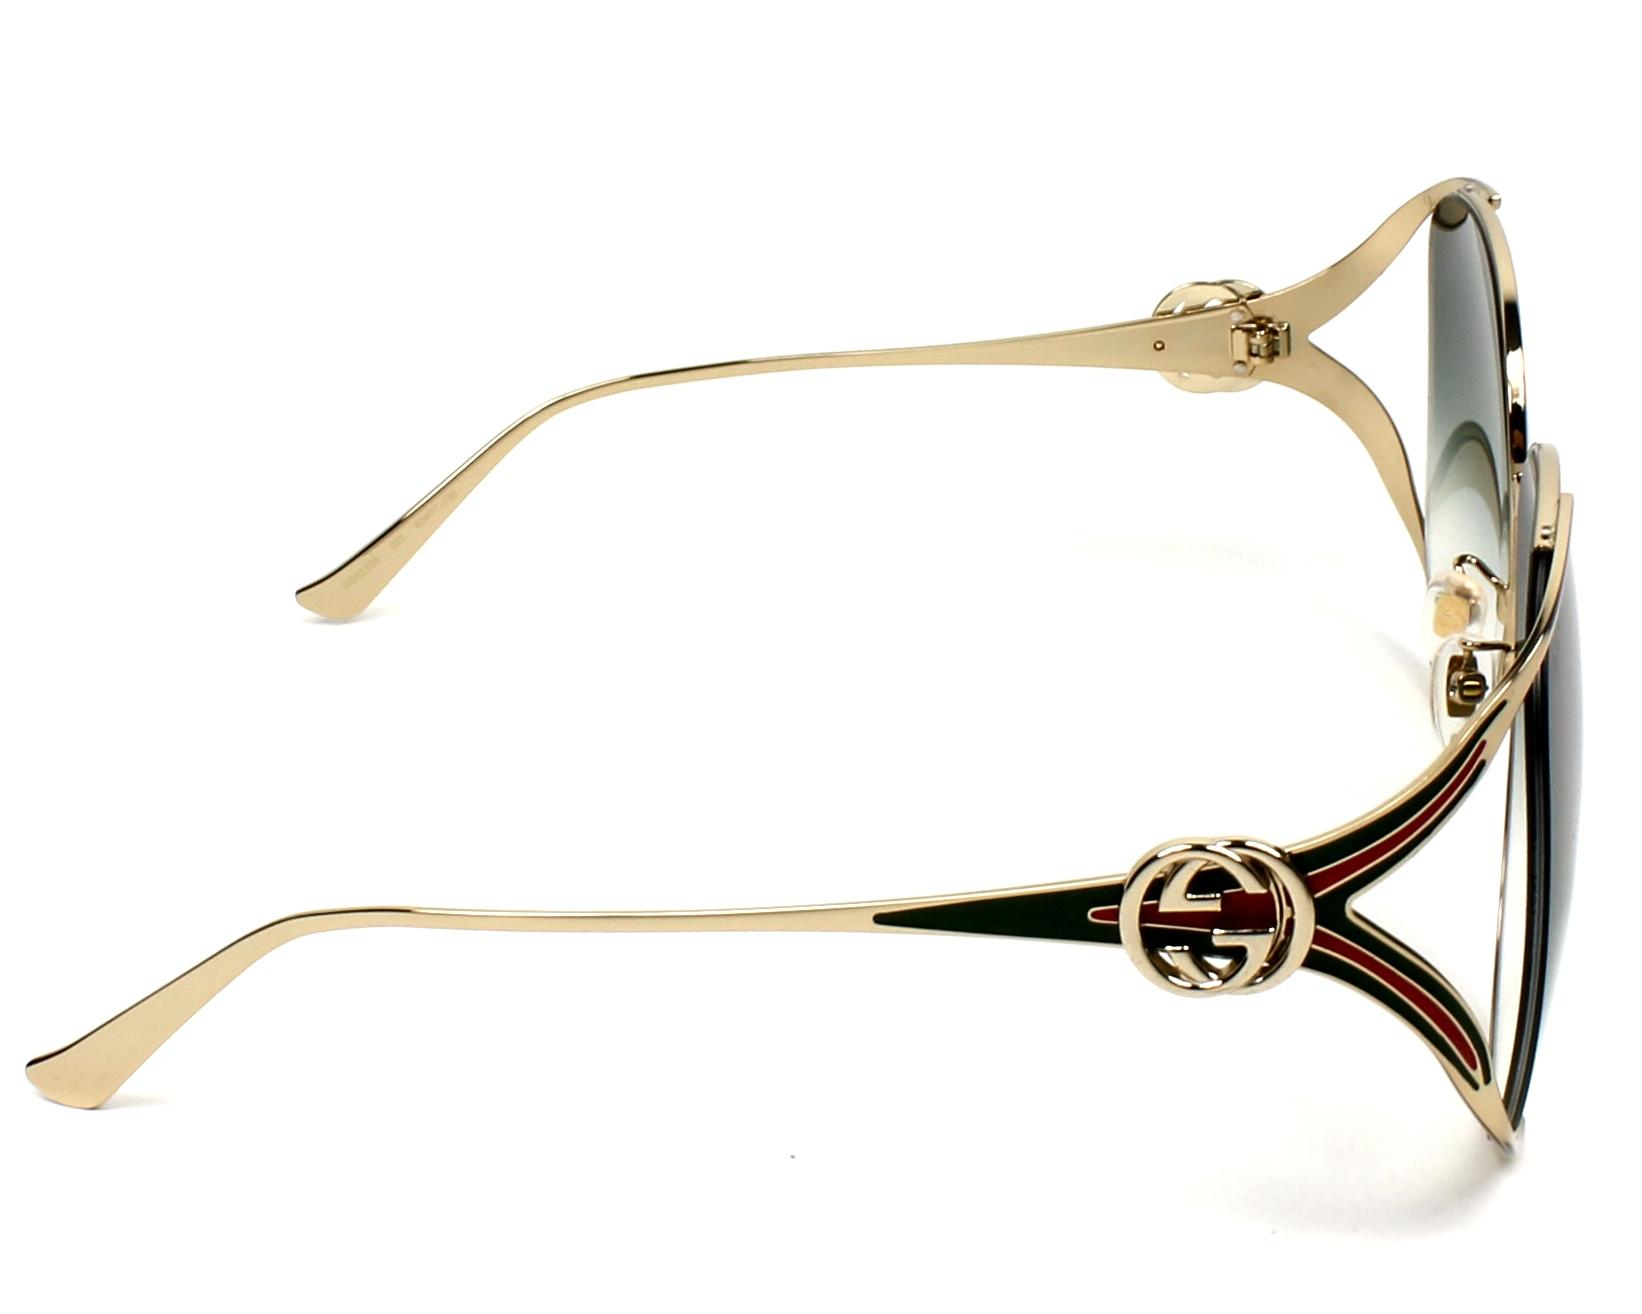 4a965f7893 Sunglasses Gucci GG-0225-S 003 63-17 Gold Green side view